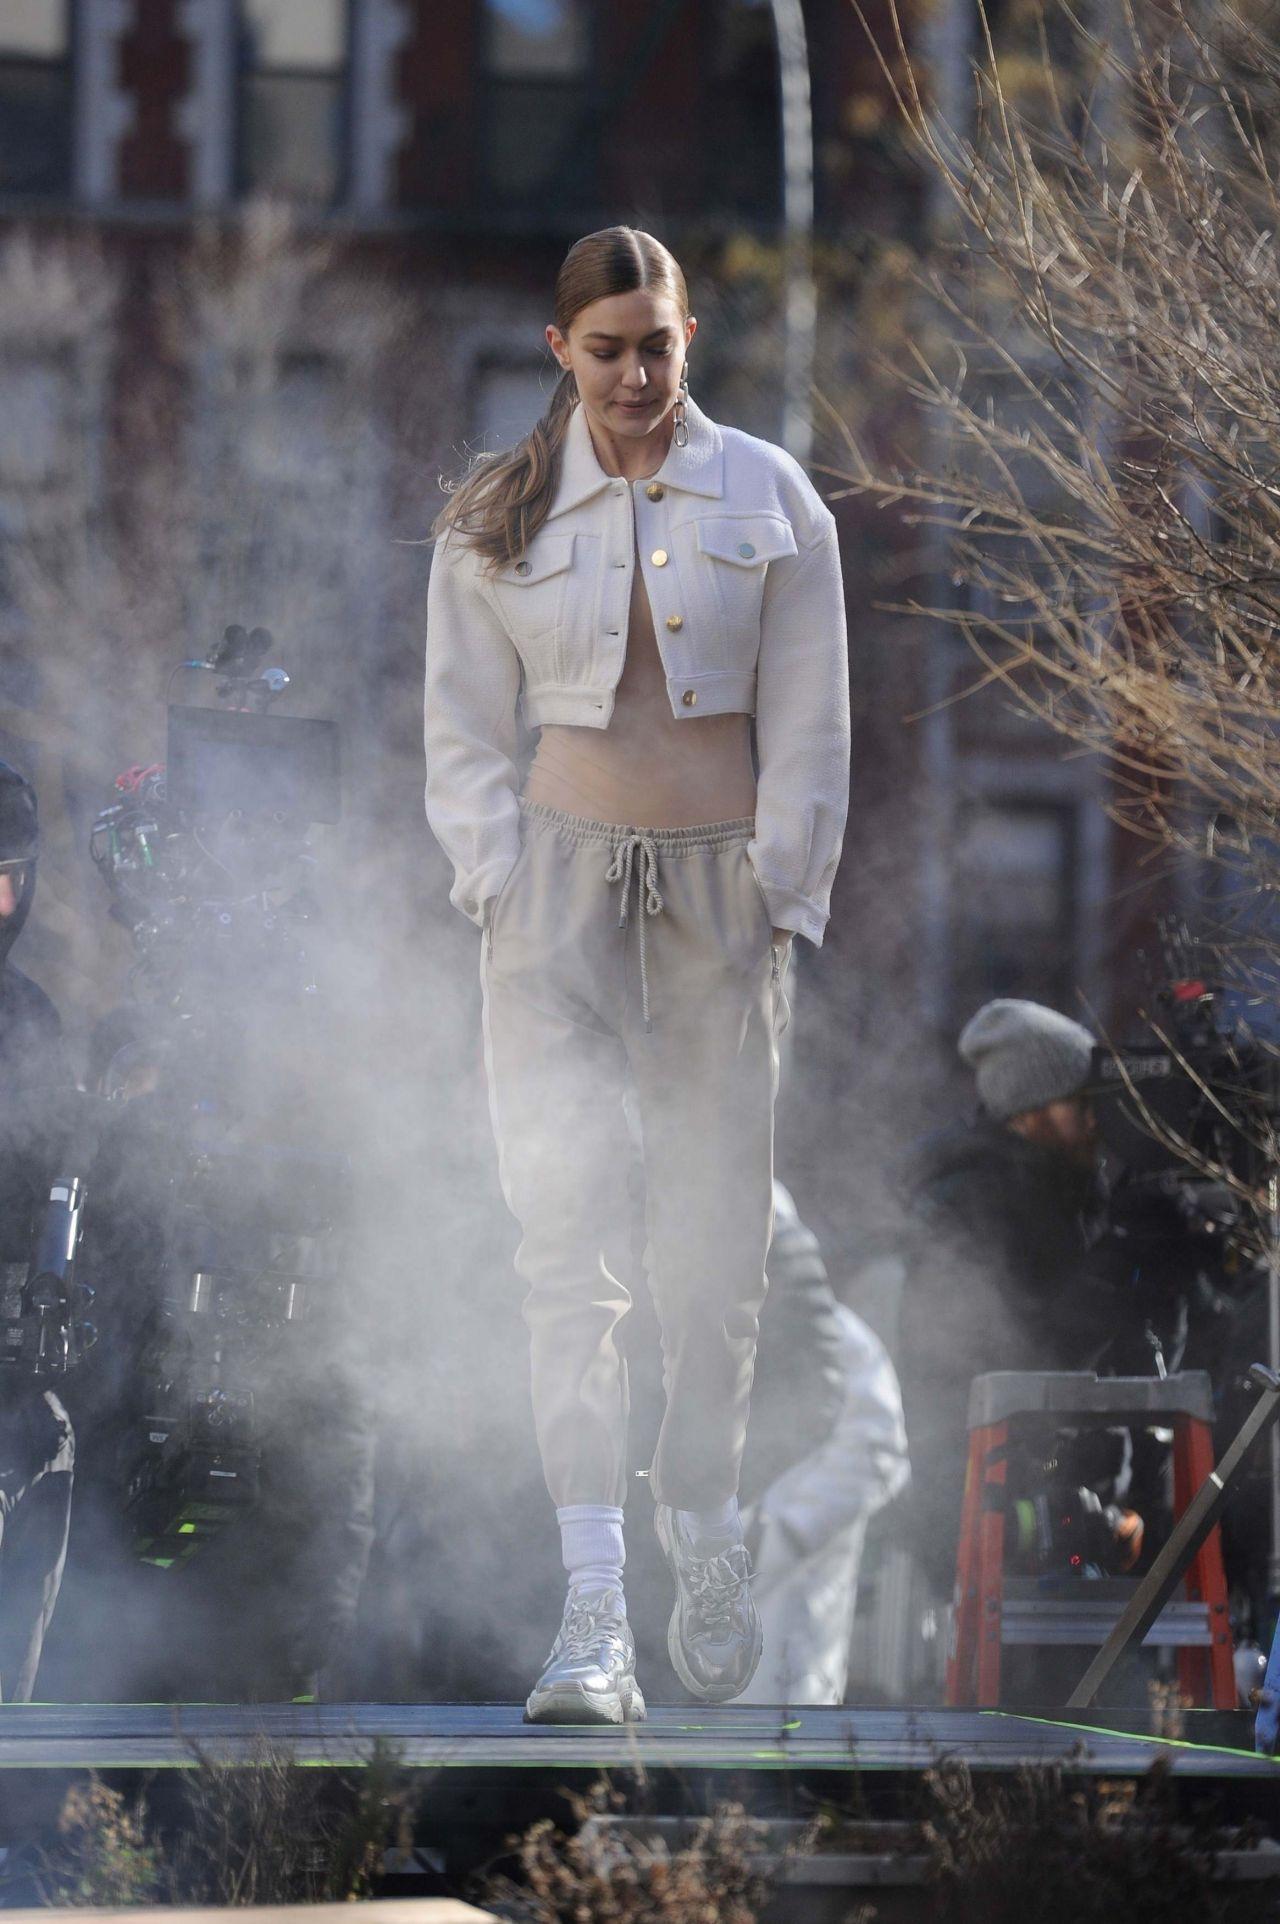 Gigi Hadid Photoshoot Nyc 17 Bailee Madison Anthem Teenage Prophet